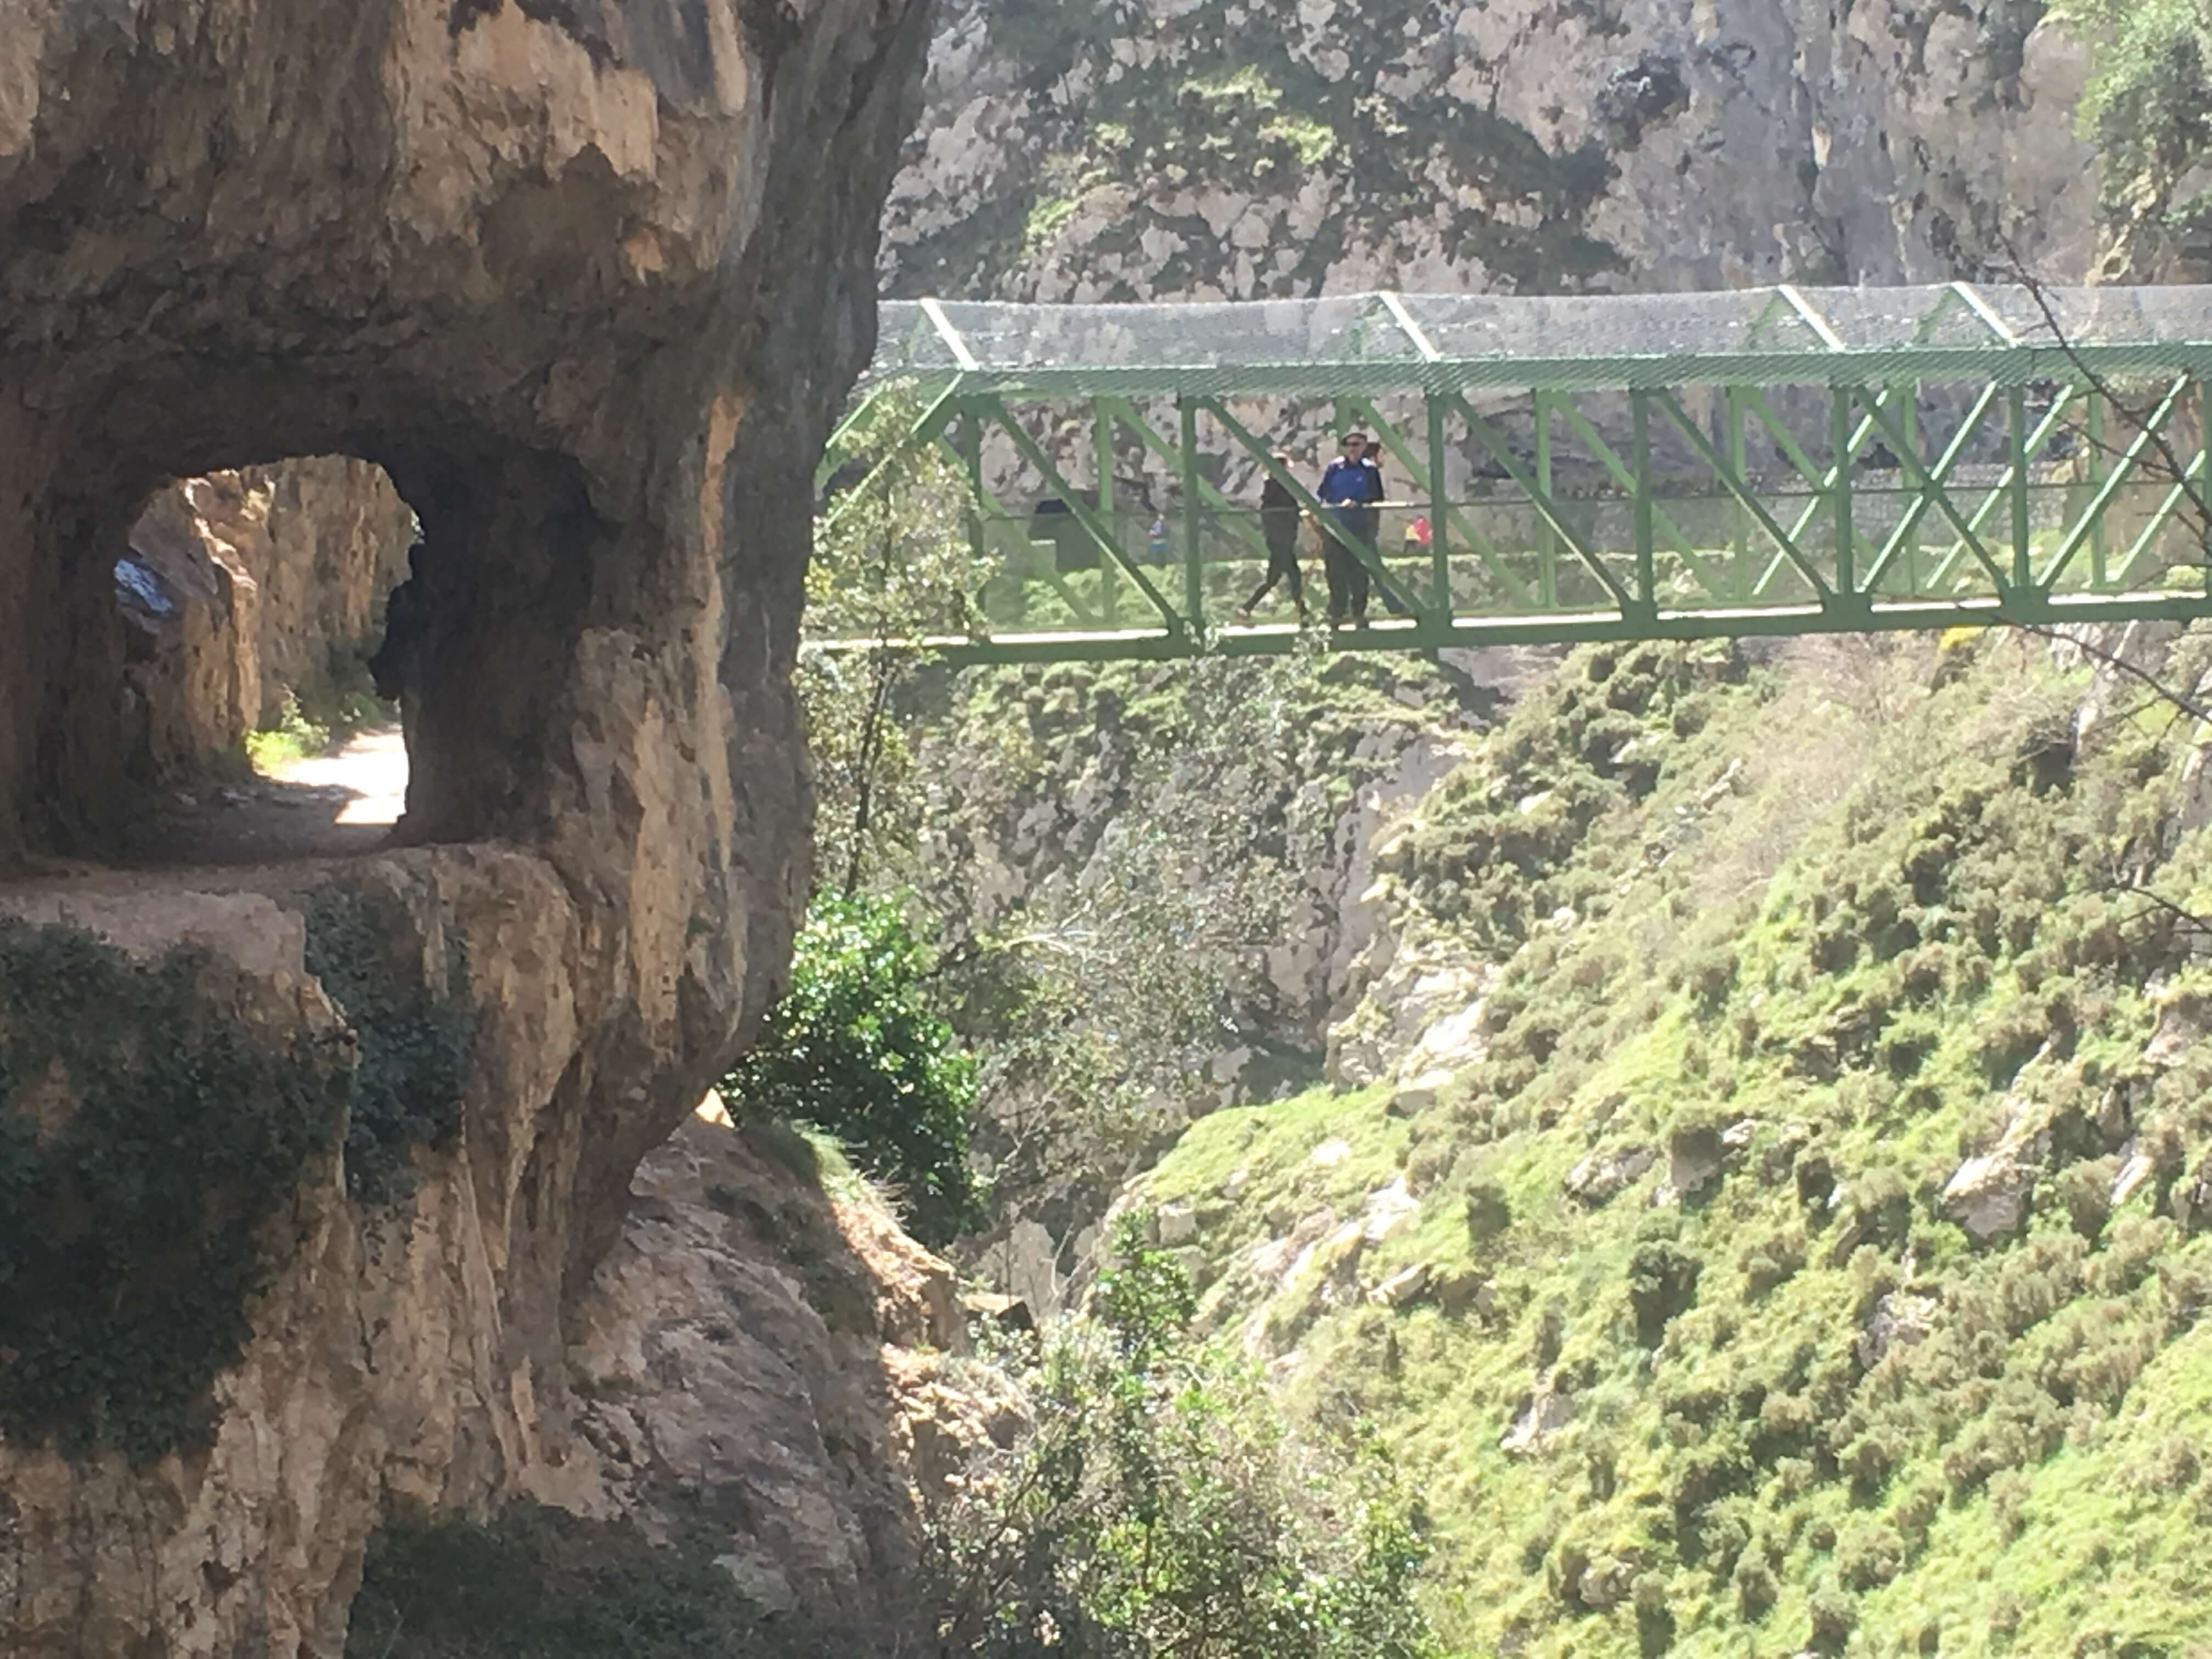 Suspension bridge across a deep gorge on the Cares River trail